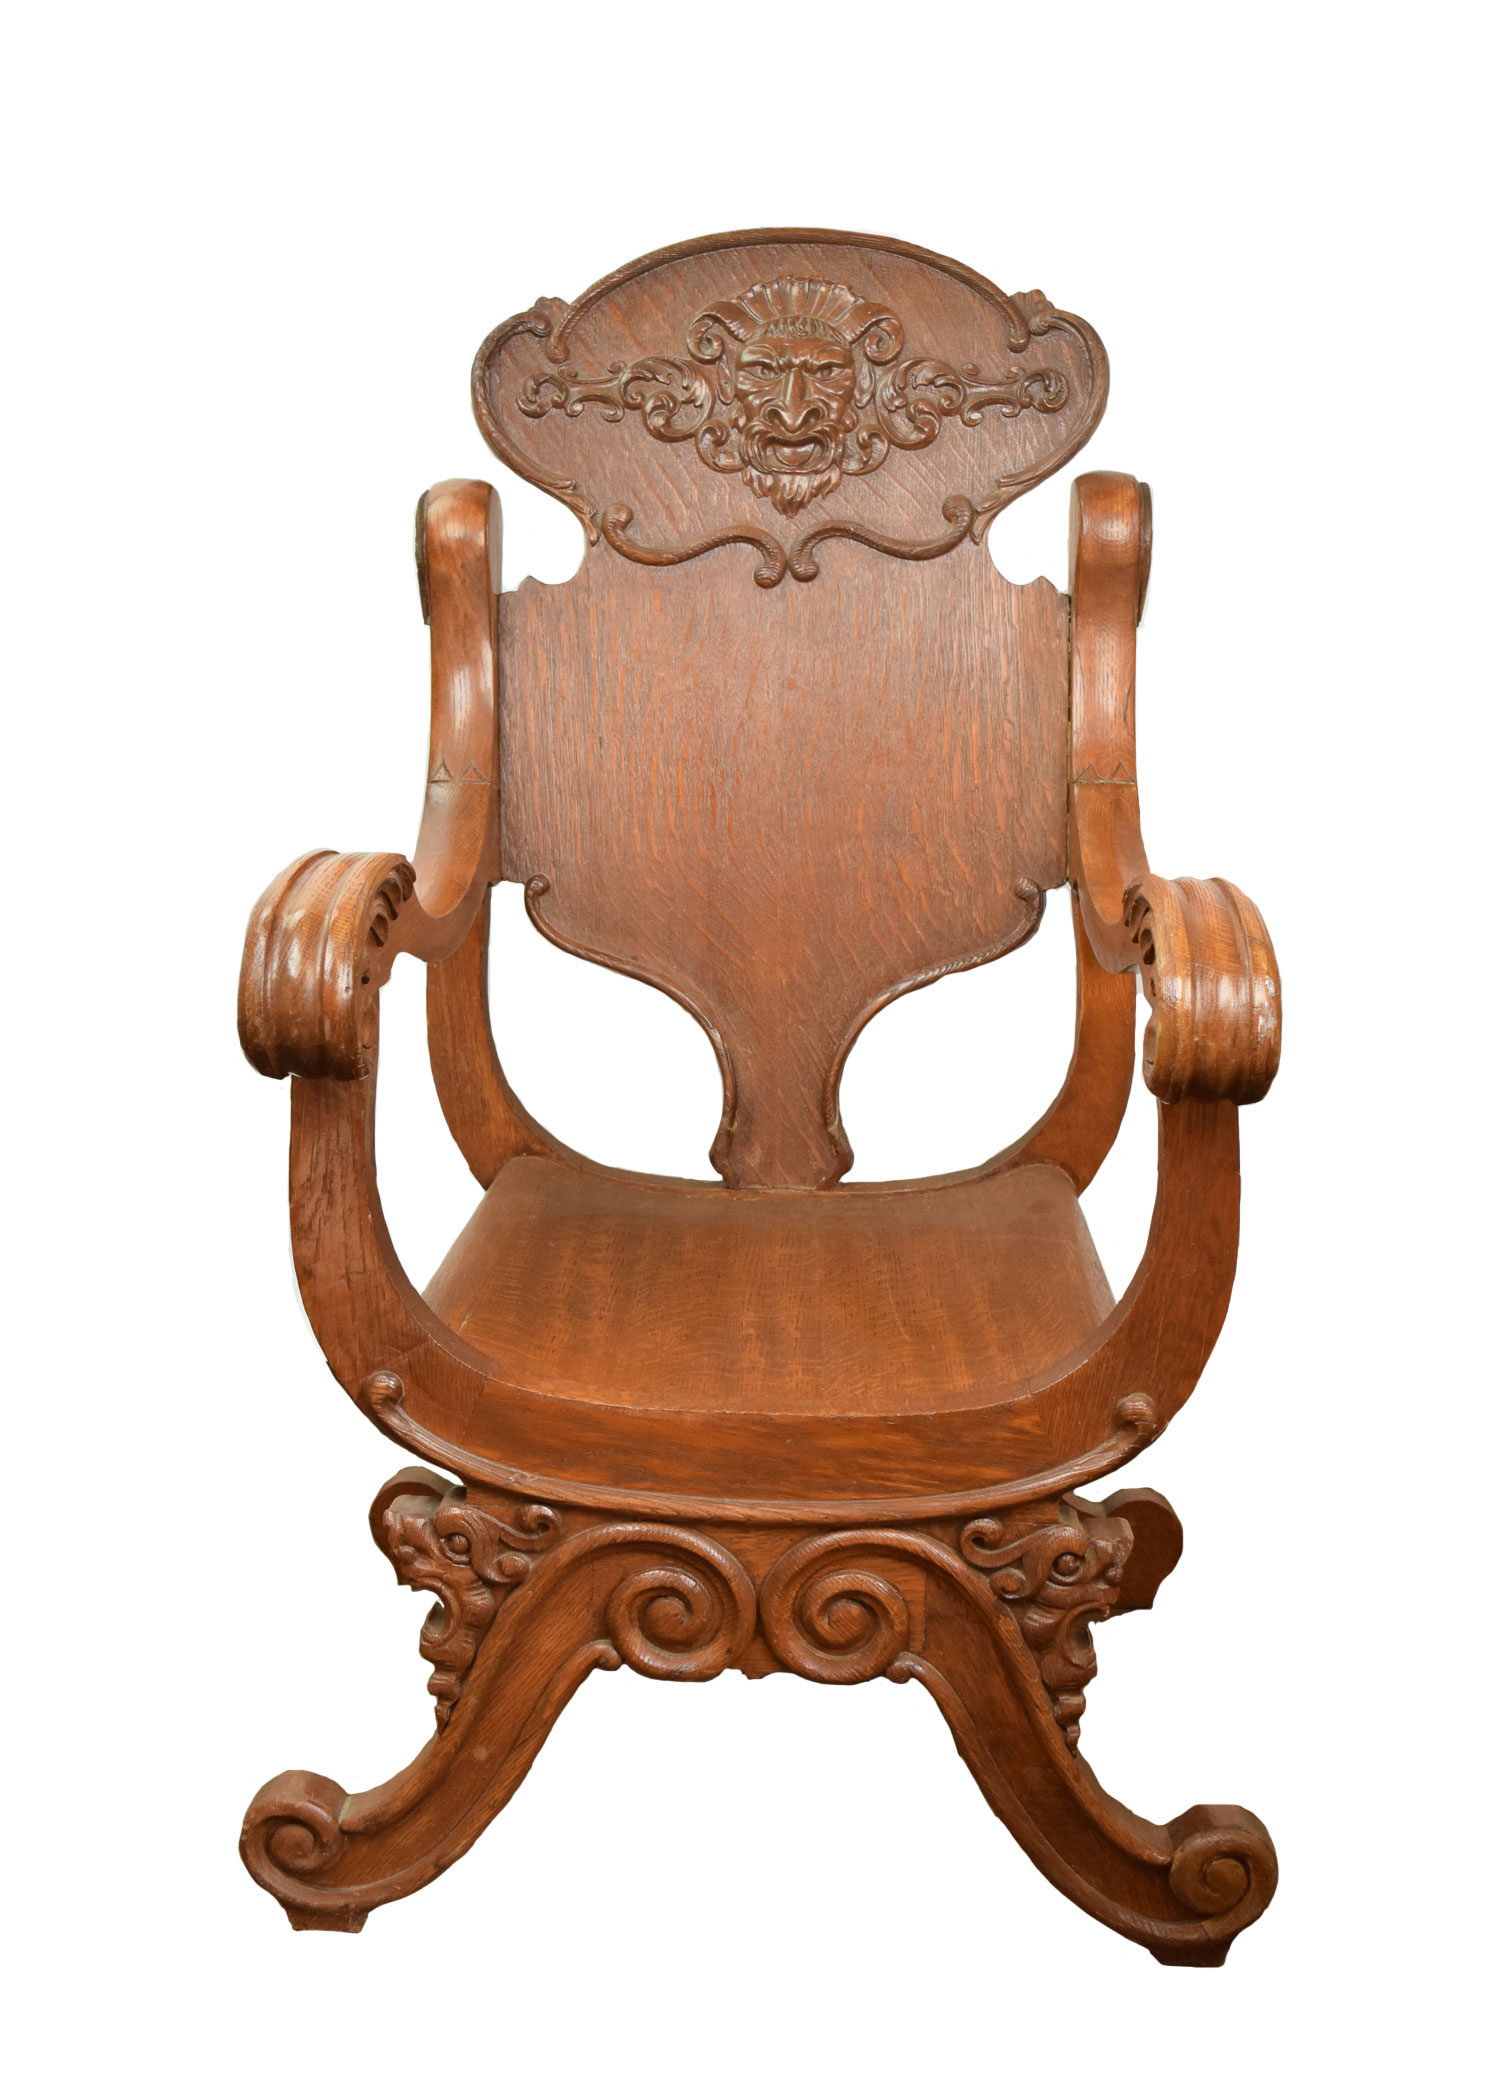 victorian oak arm chair with zeus' face